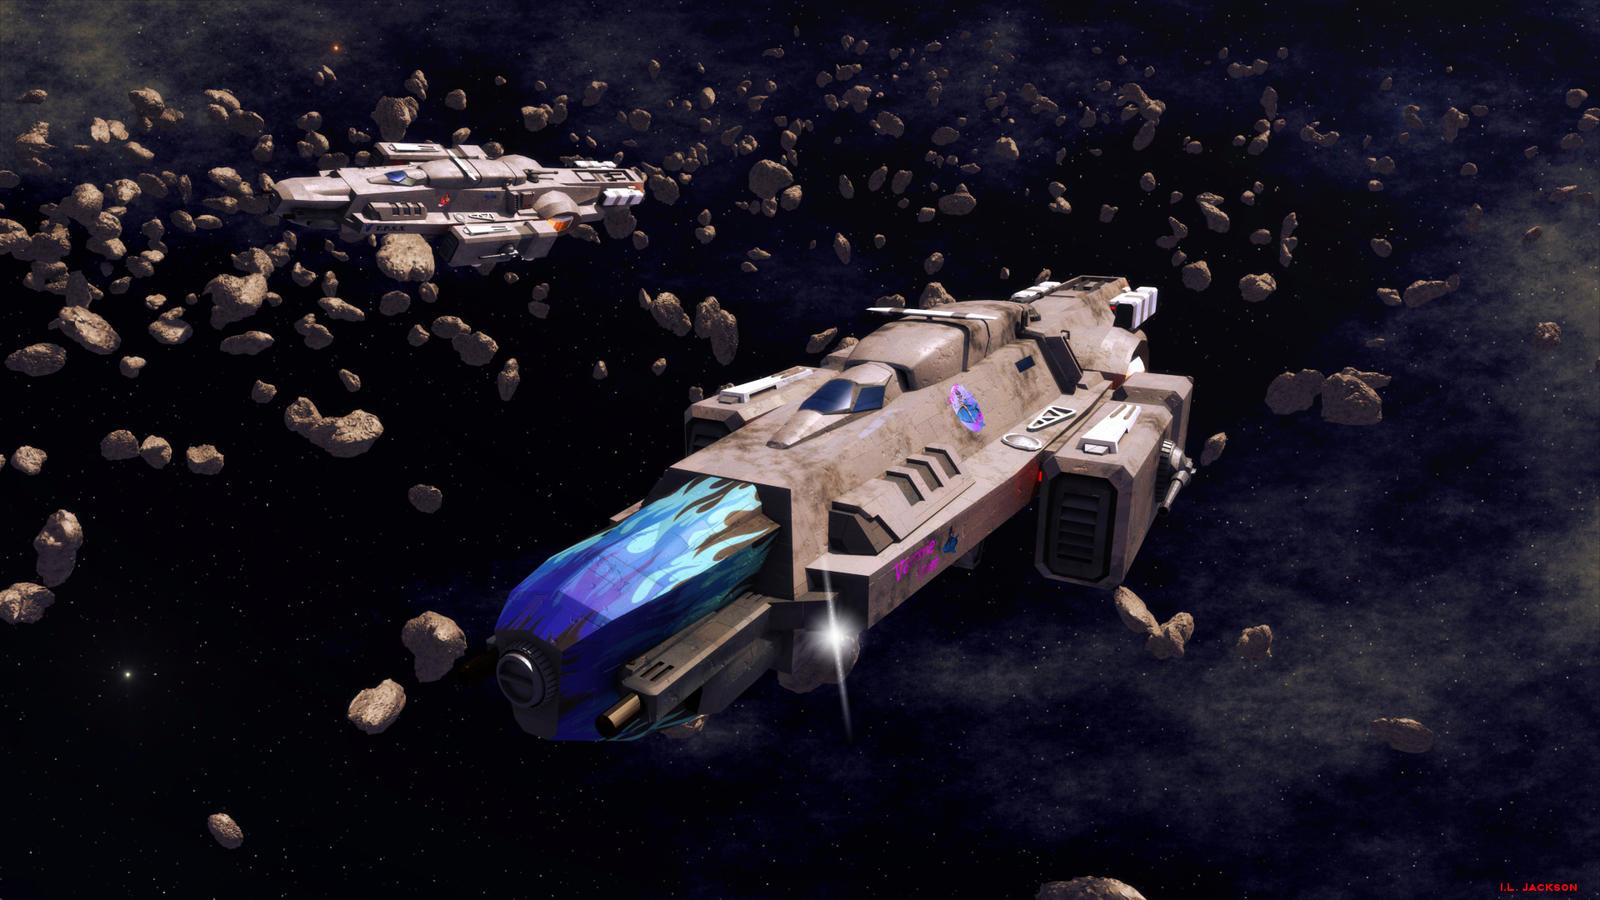 Dagger Class Corvettes by ILJackson